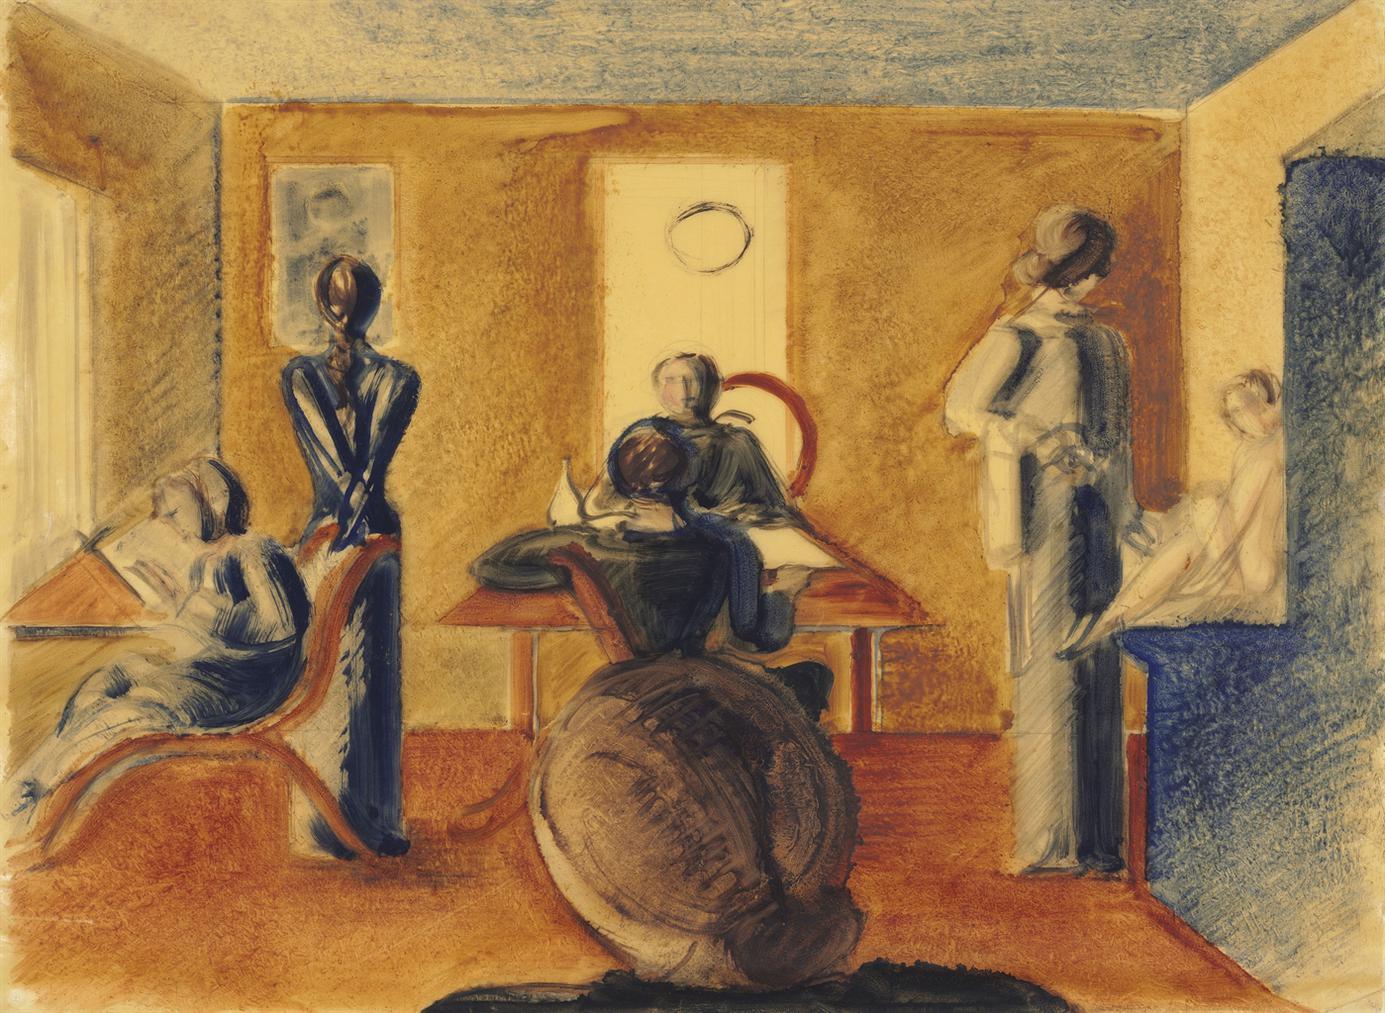 Oskar Schlemmer-Raum Mit Sieben Figuren-1937